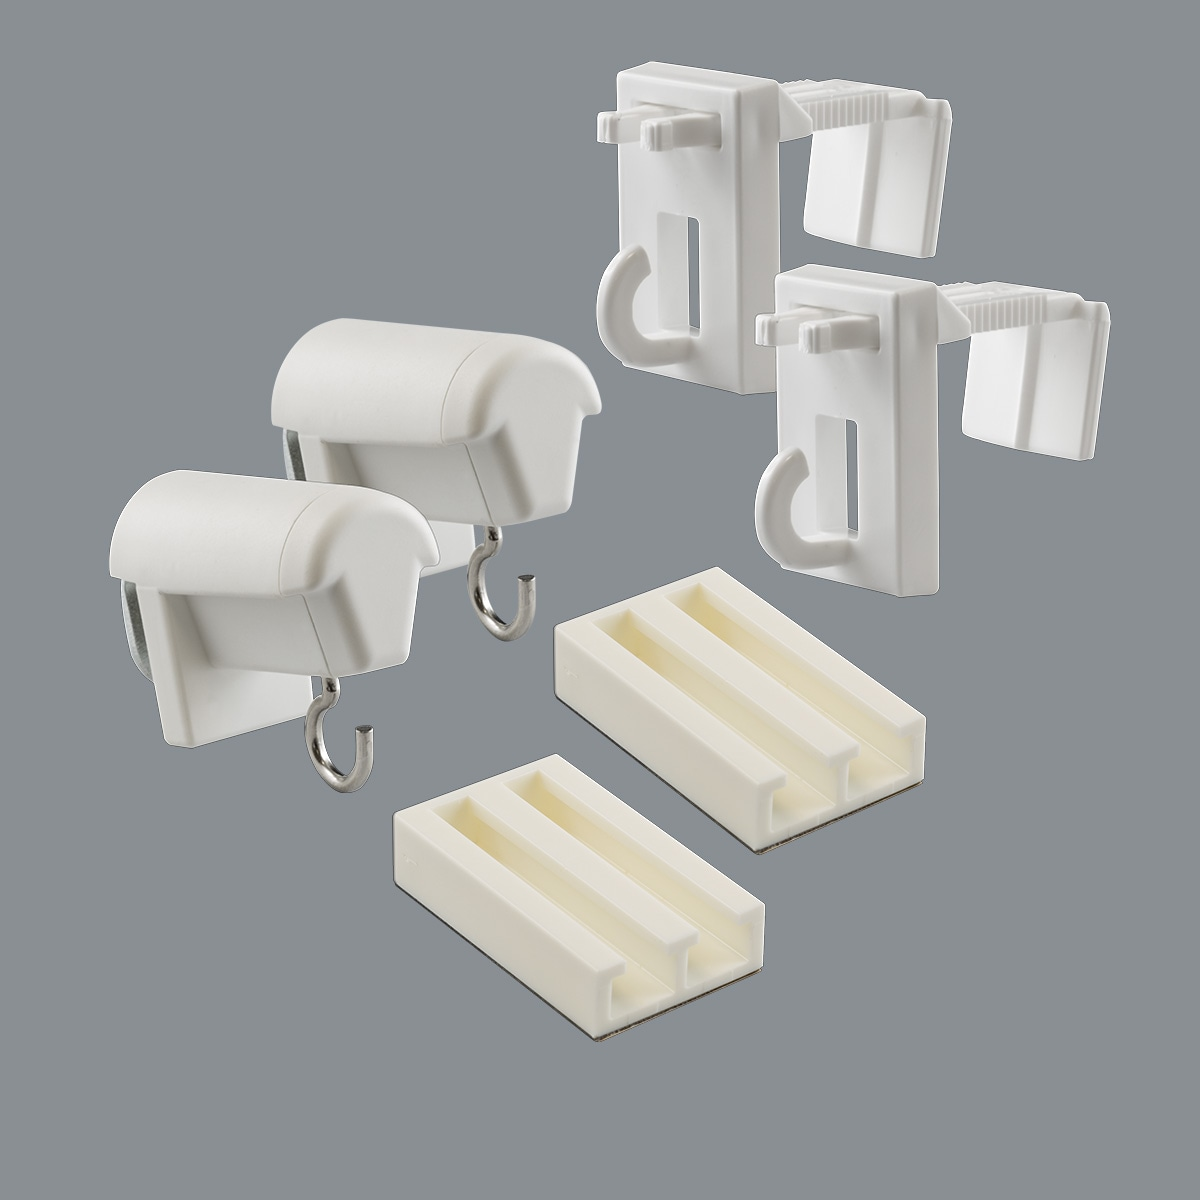 rollo doppelrollos bambusrollos und raffrollos. Black Bedroom Furniture Sets. Home Design Ideas